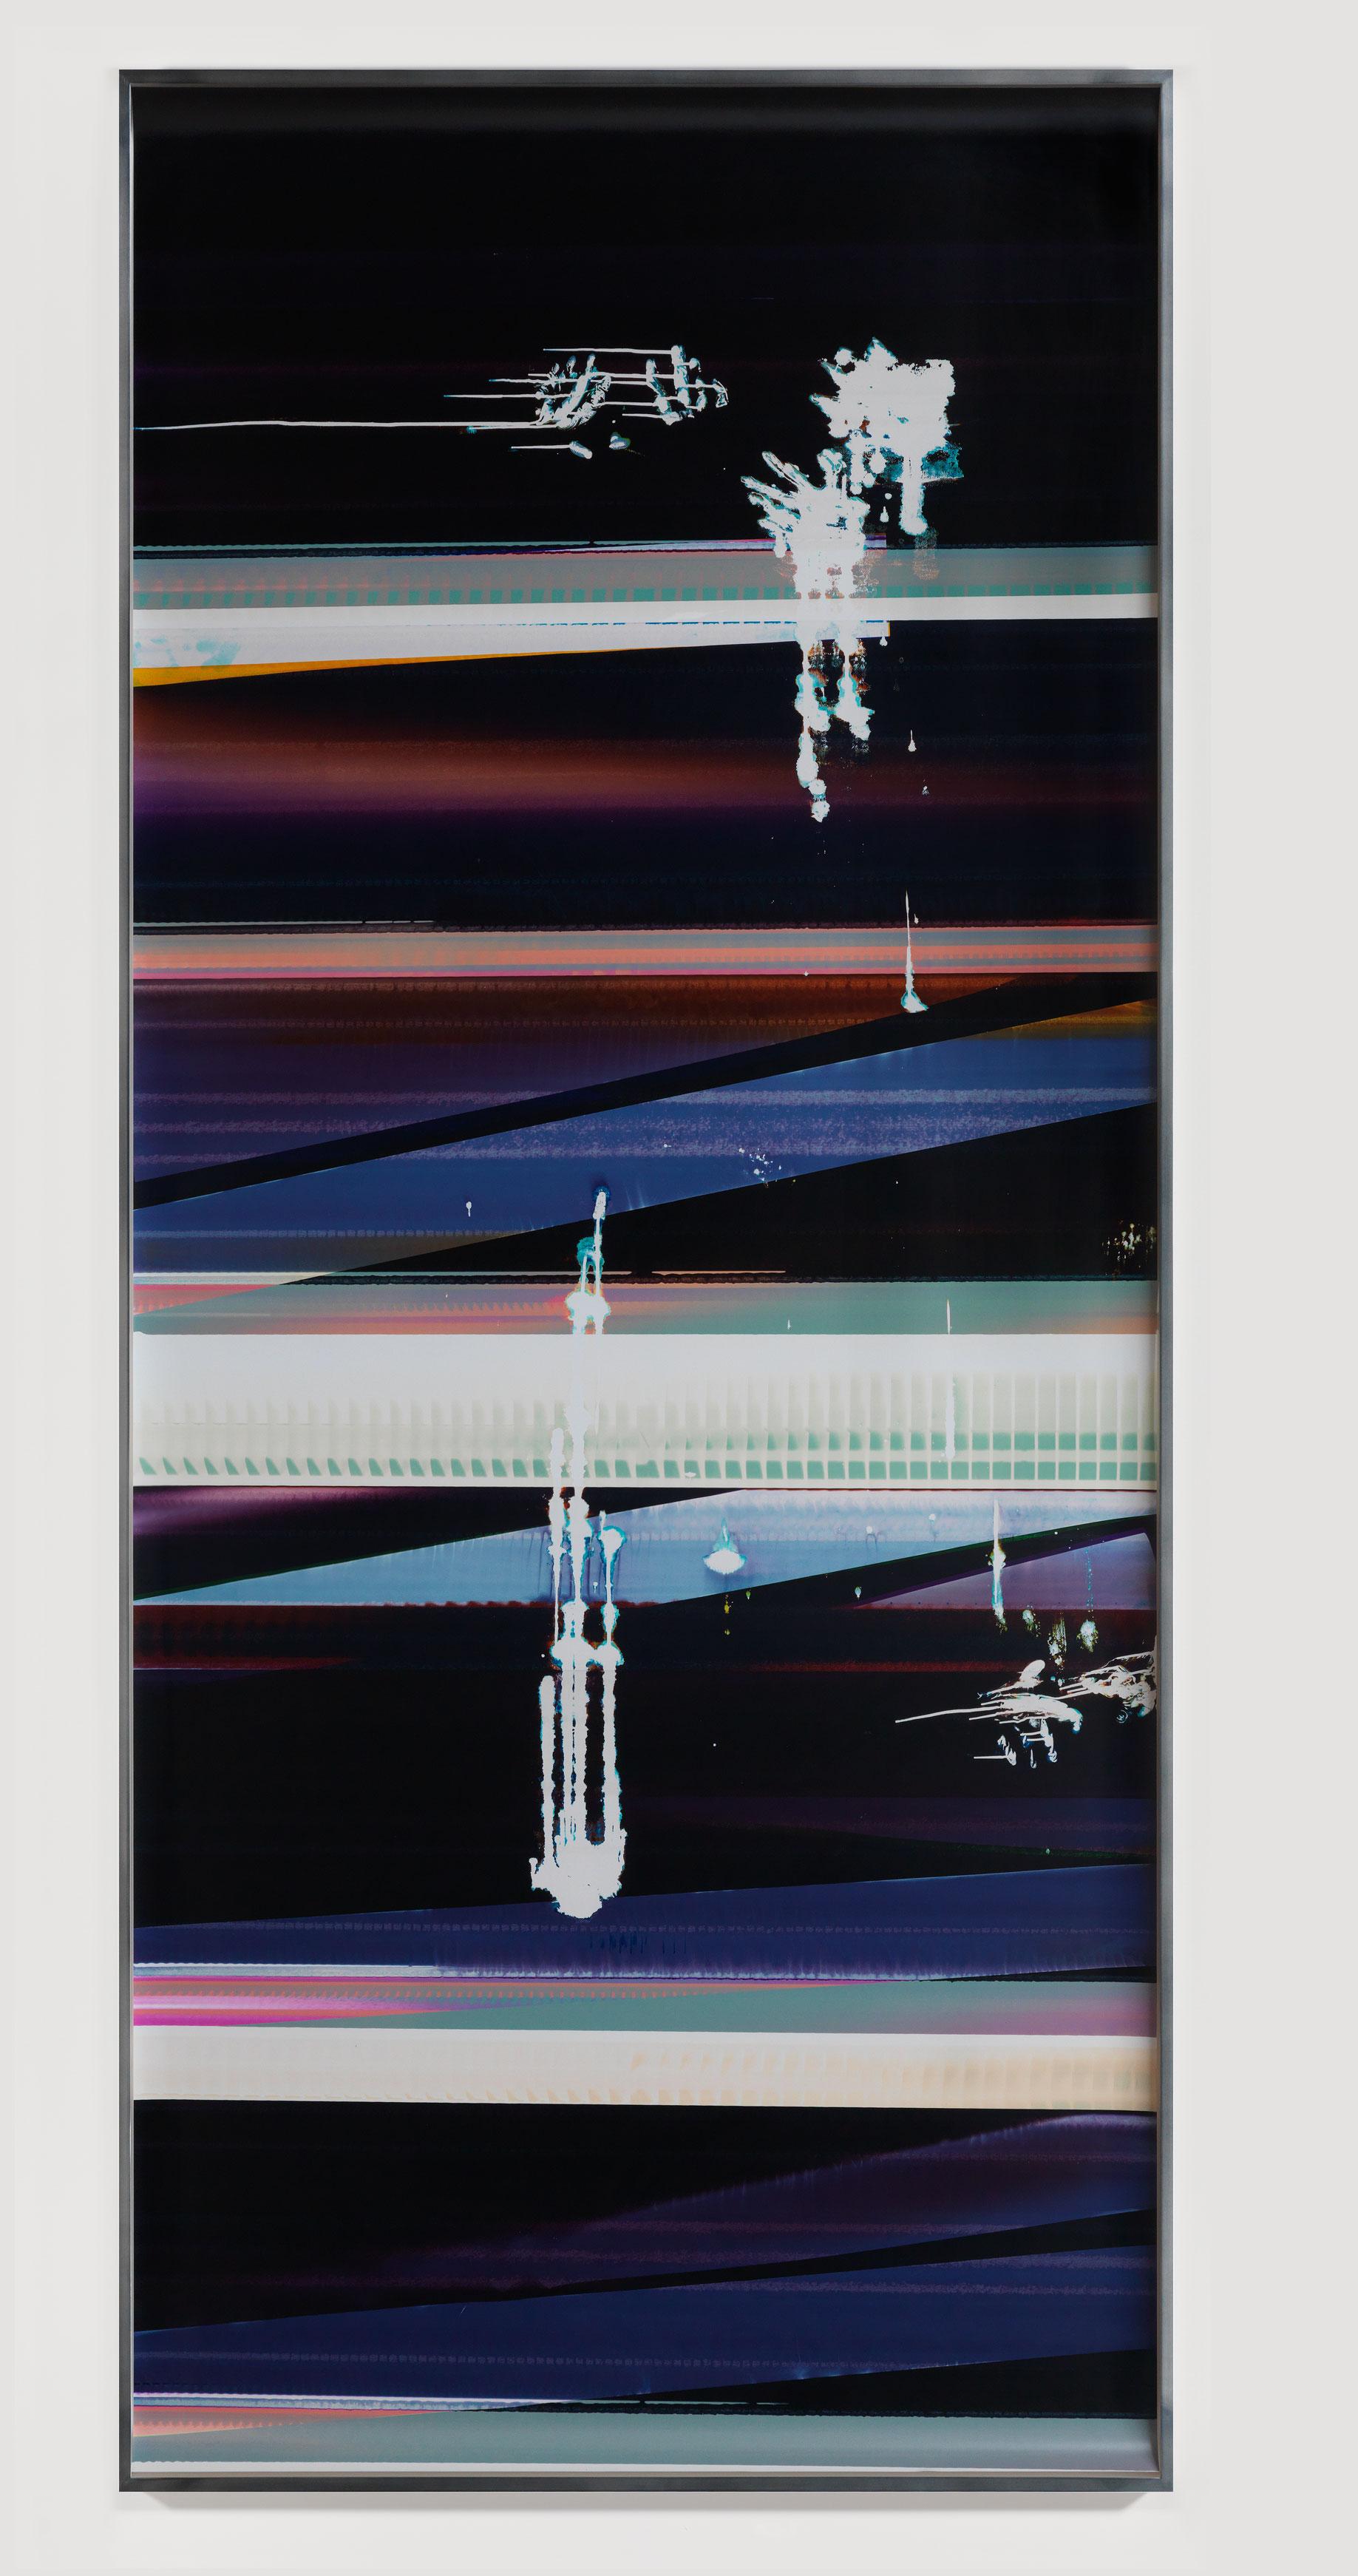 Cross-Contaminated RA4 Contact Print [Black Curl (9:6/MCY/Six Magnet: Los Angeles, California, August 14, 2014, Fujicolor Crystal Archive Super Type C, Em. No. 112-012, Kodak Ektacolor RA Bleach-Fix and Replenisher, Cat. No. 847 1484, 95514), Kreonite KM IV 5225 RA4 Color Processor, Ser. No. 00092174]   2014  Color photographic paper  119 1/2 x 50 inches   RA4 Contact Print Curls, 2014–    Gastarbeiten, 2014